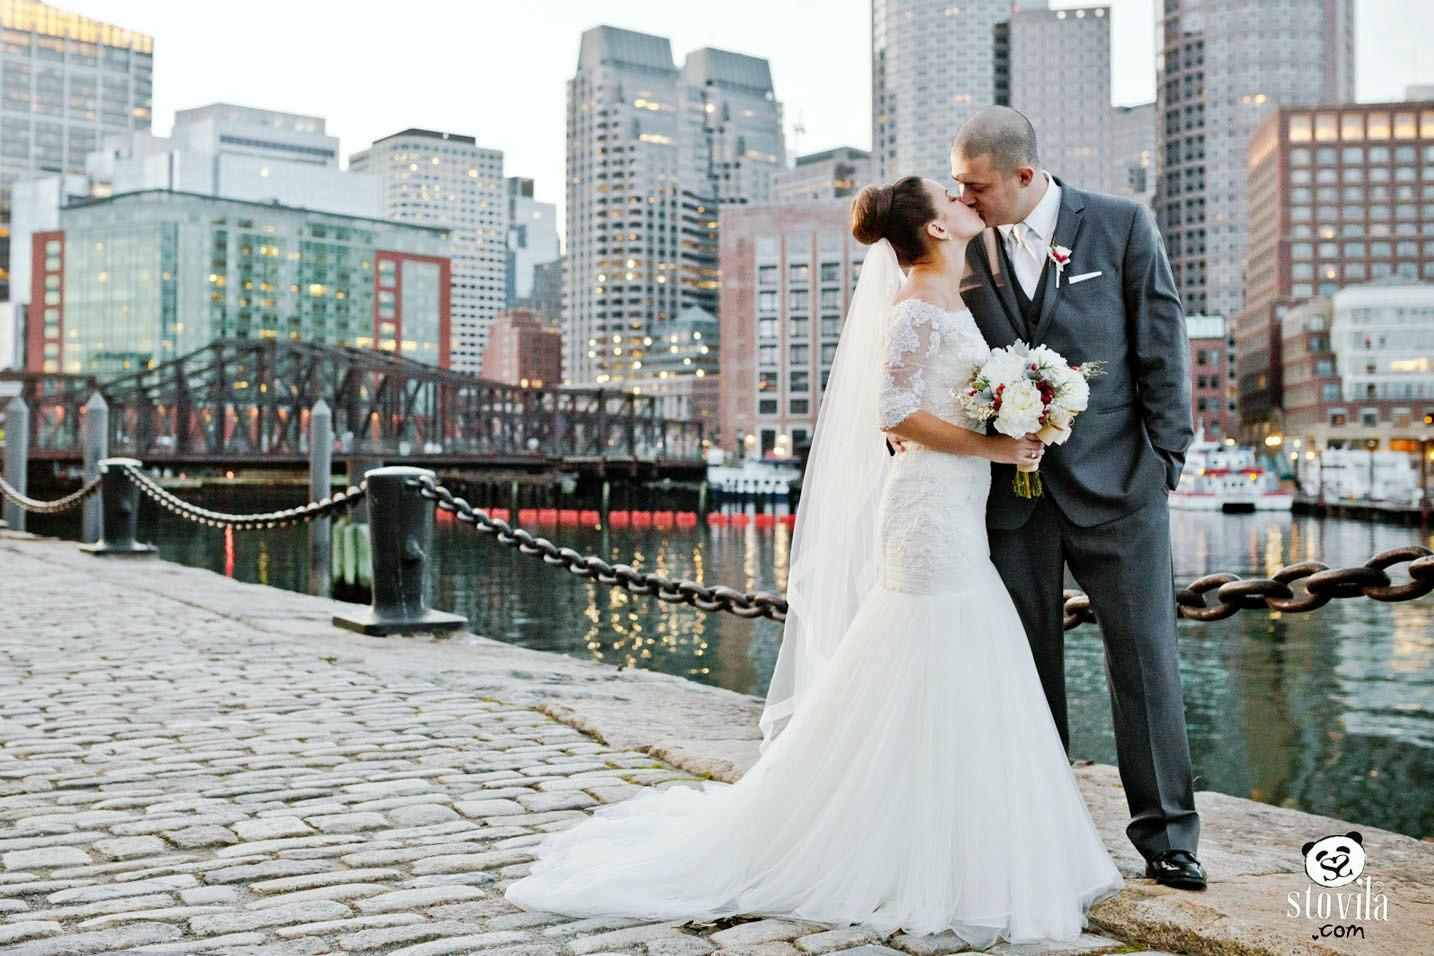 Kristen & Bryan Wedding - Tirrell Room, Quincy MA   Boston & NH Wedding Photographers - STOVILA // Modern Professional Affordable 1